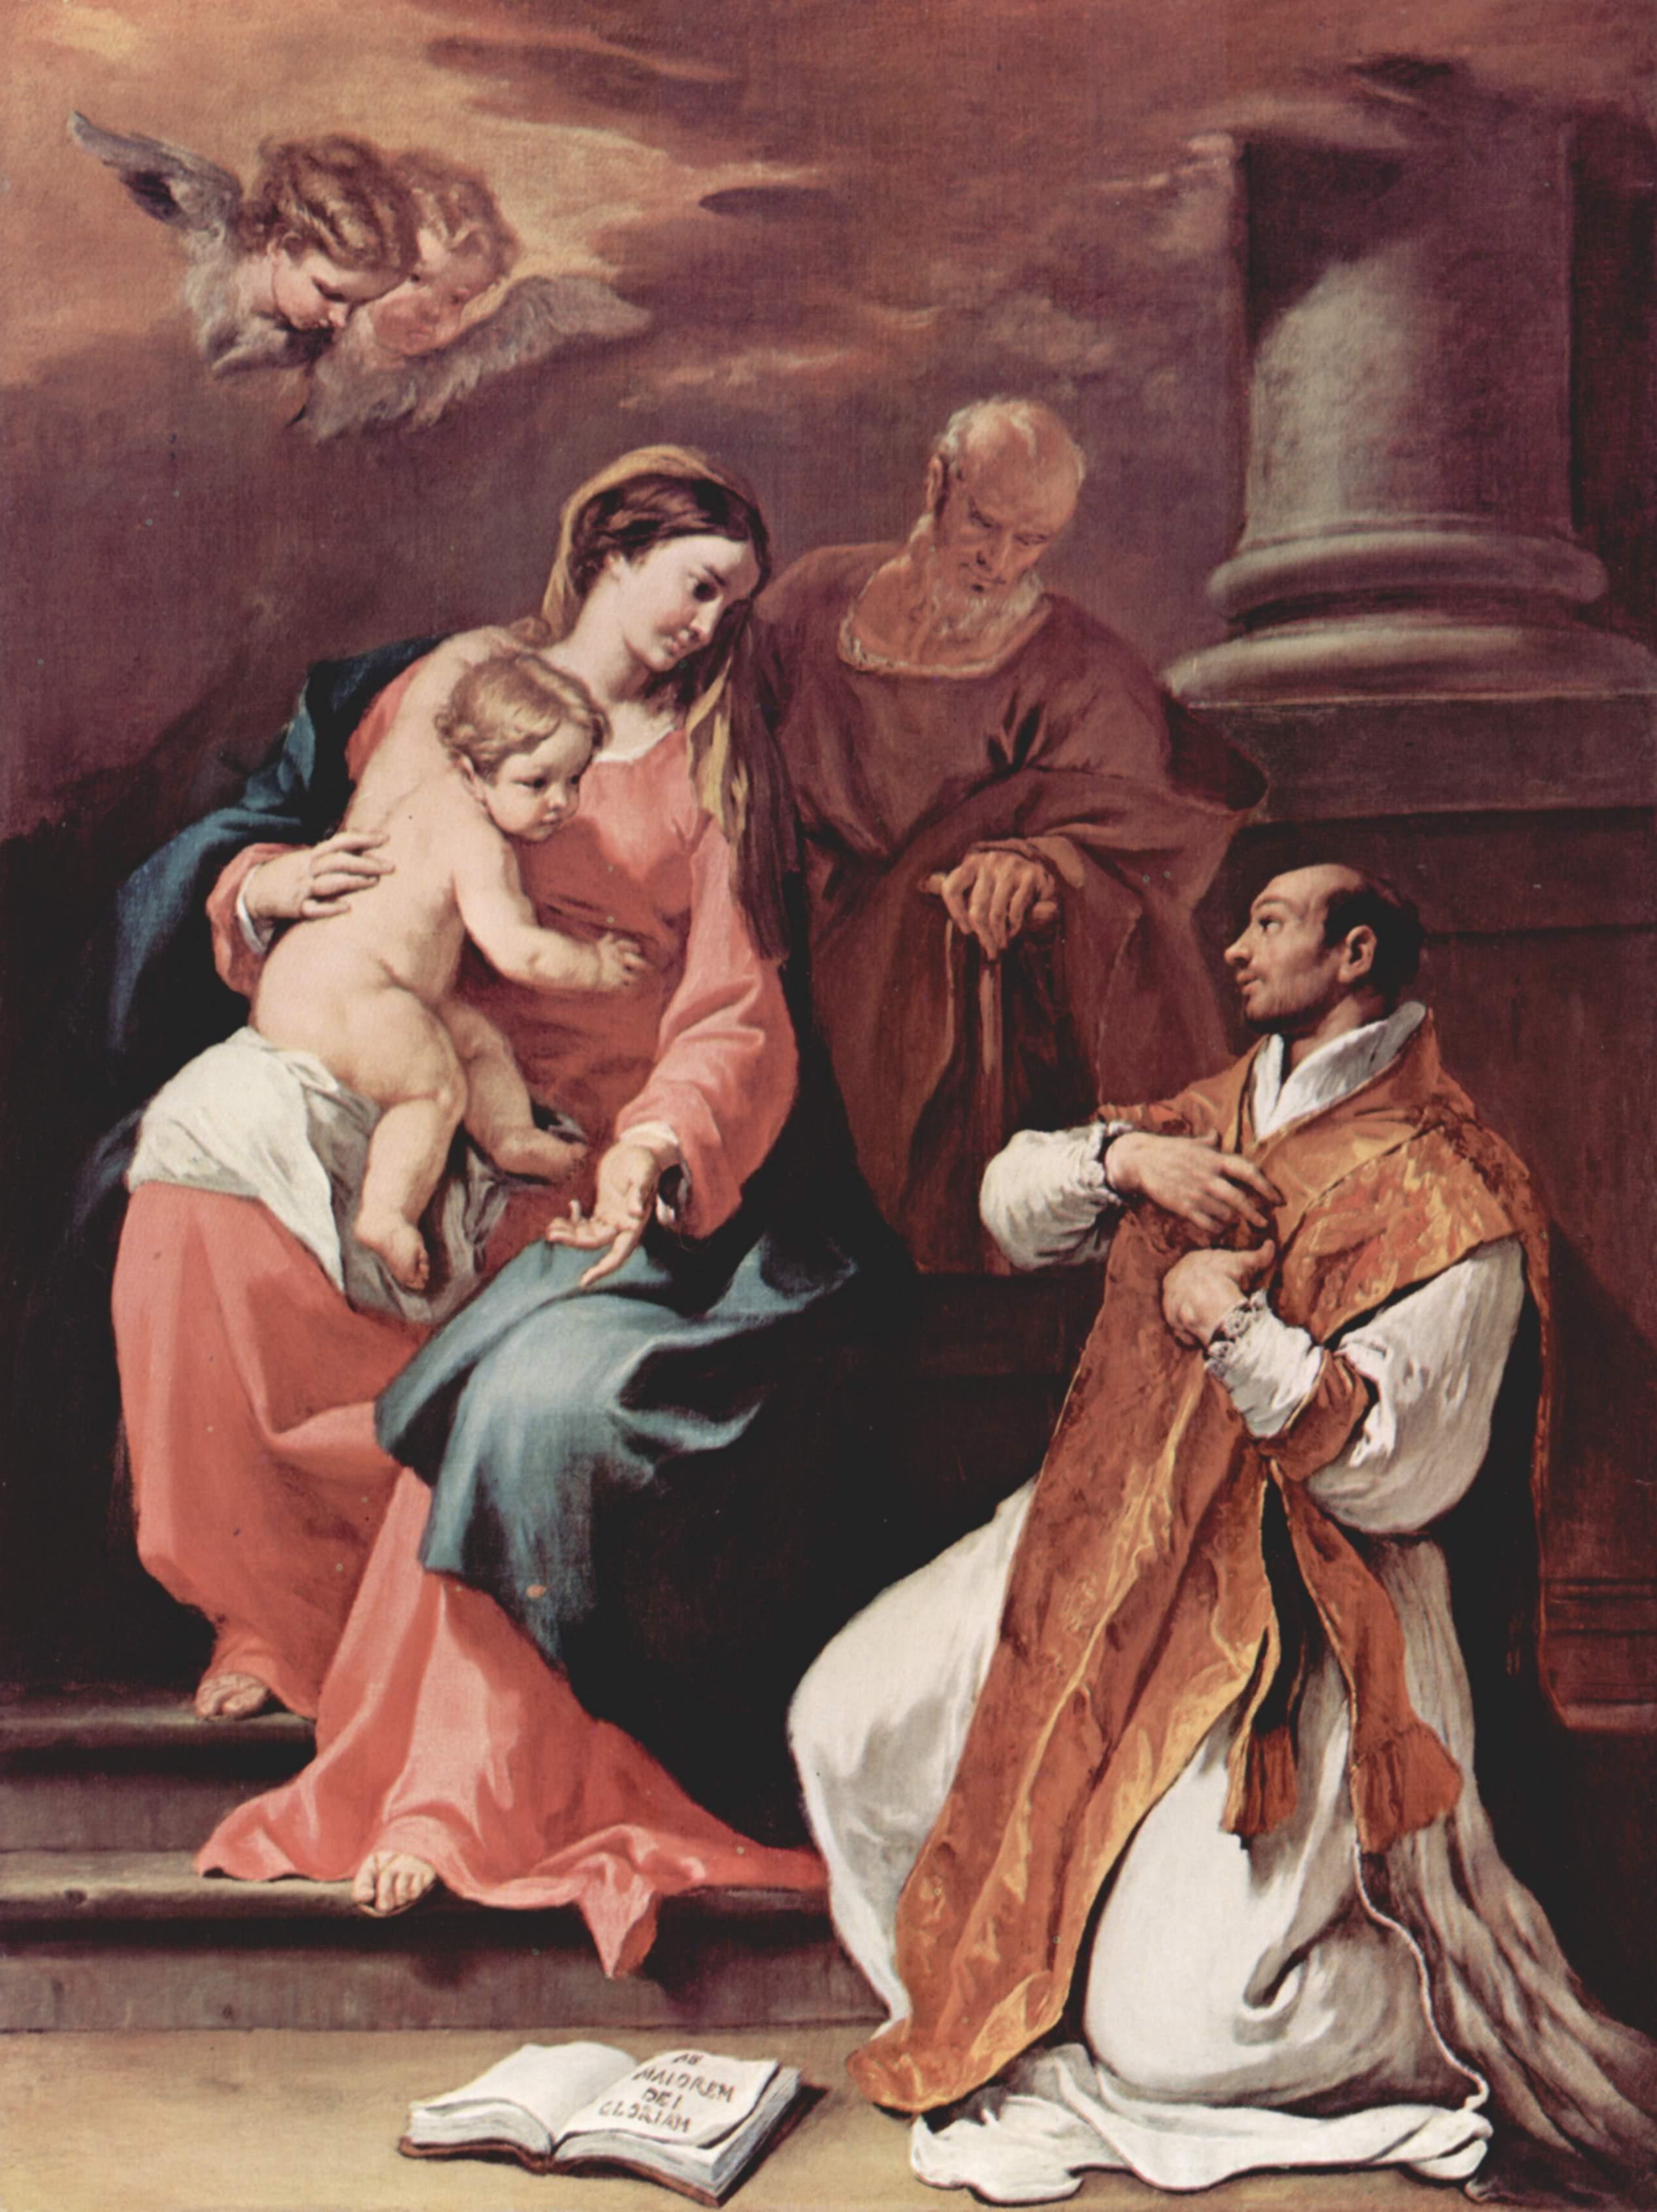 Sant' Ignazio di Loyola  dans images sacrée sebastiano_ricci_038_obnp2009-y08414